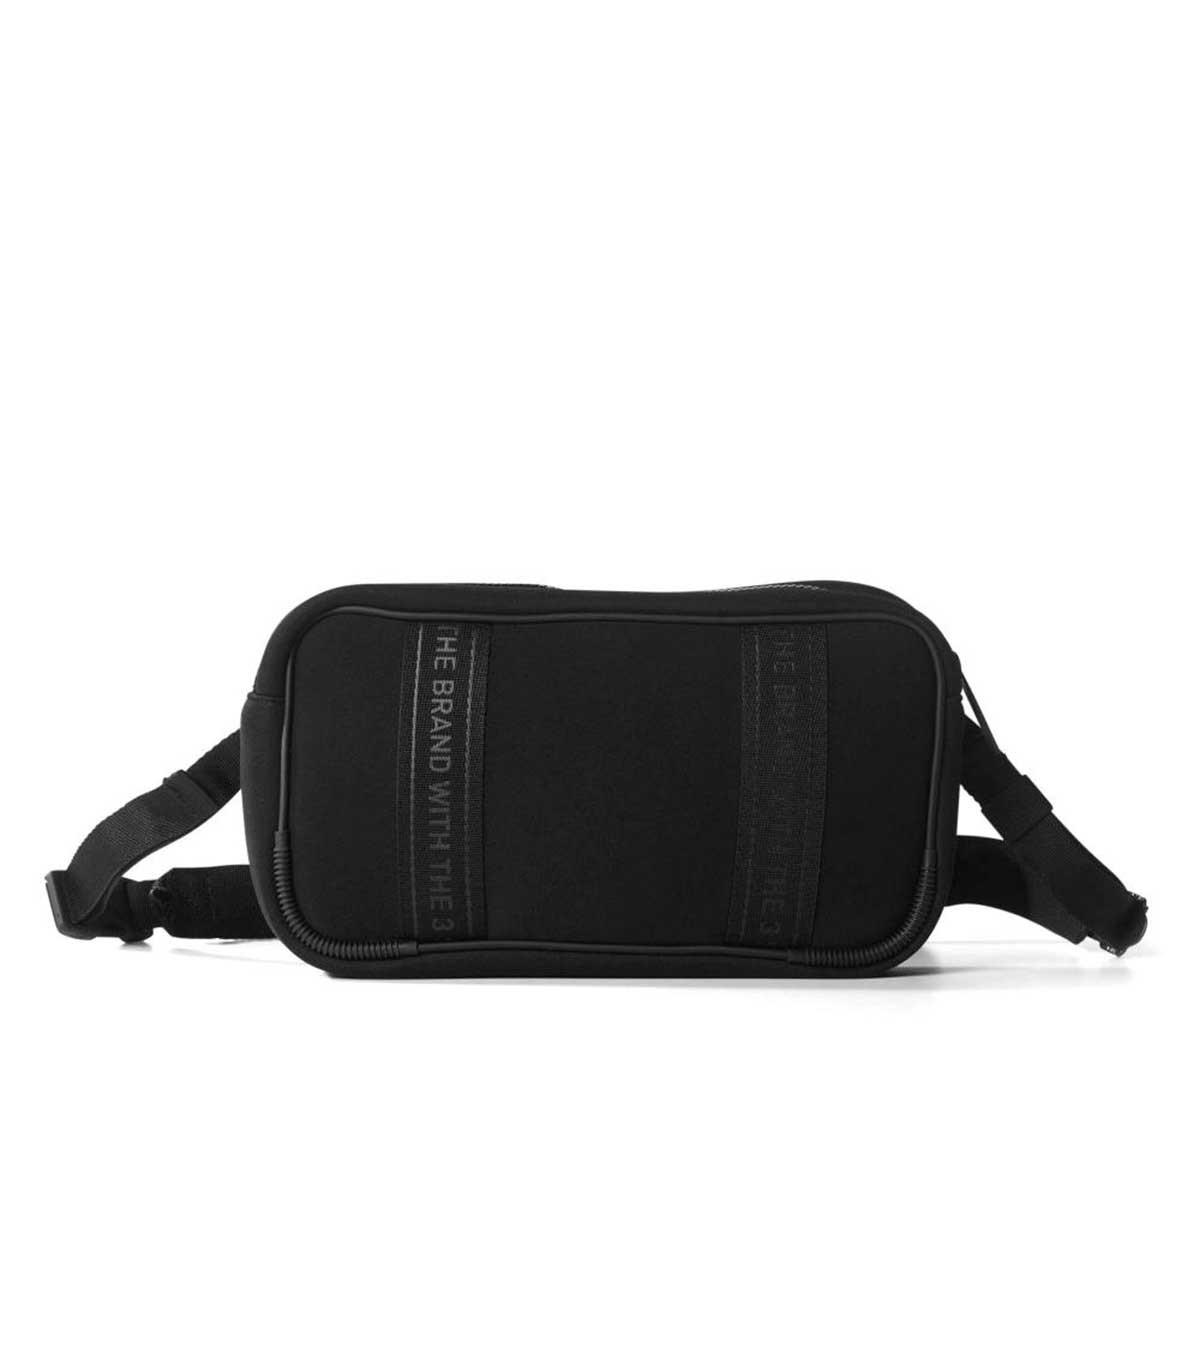 2adb58c829 Buy ADIDAS Nmd Waist bag black